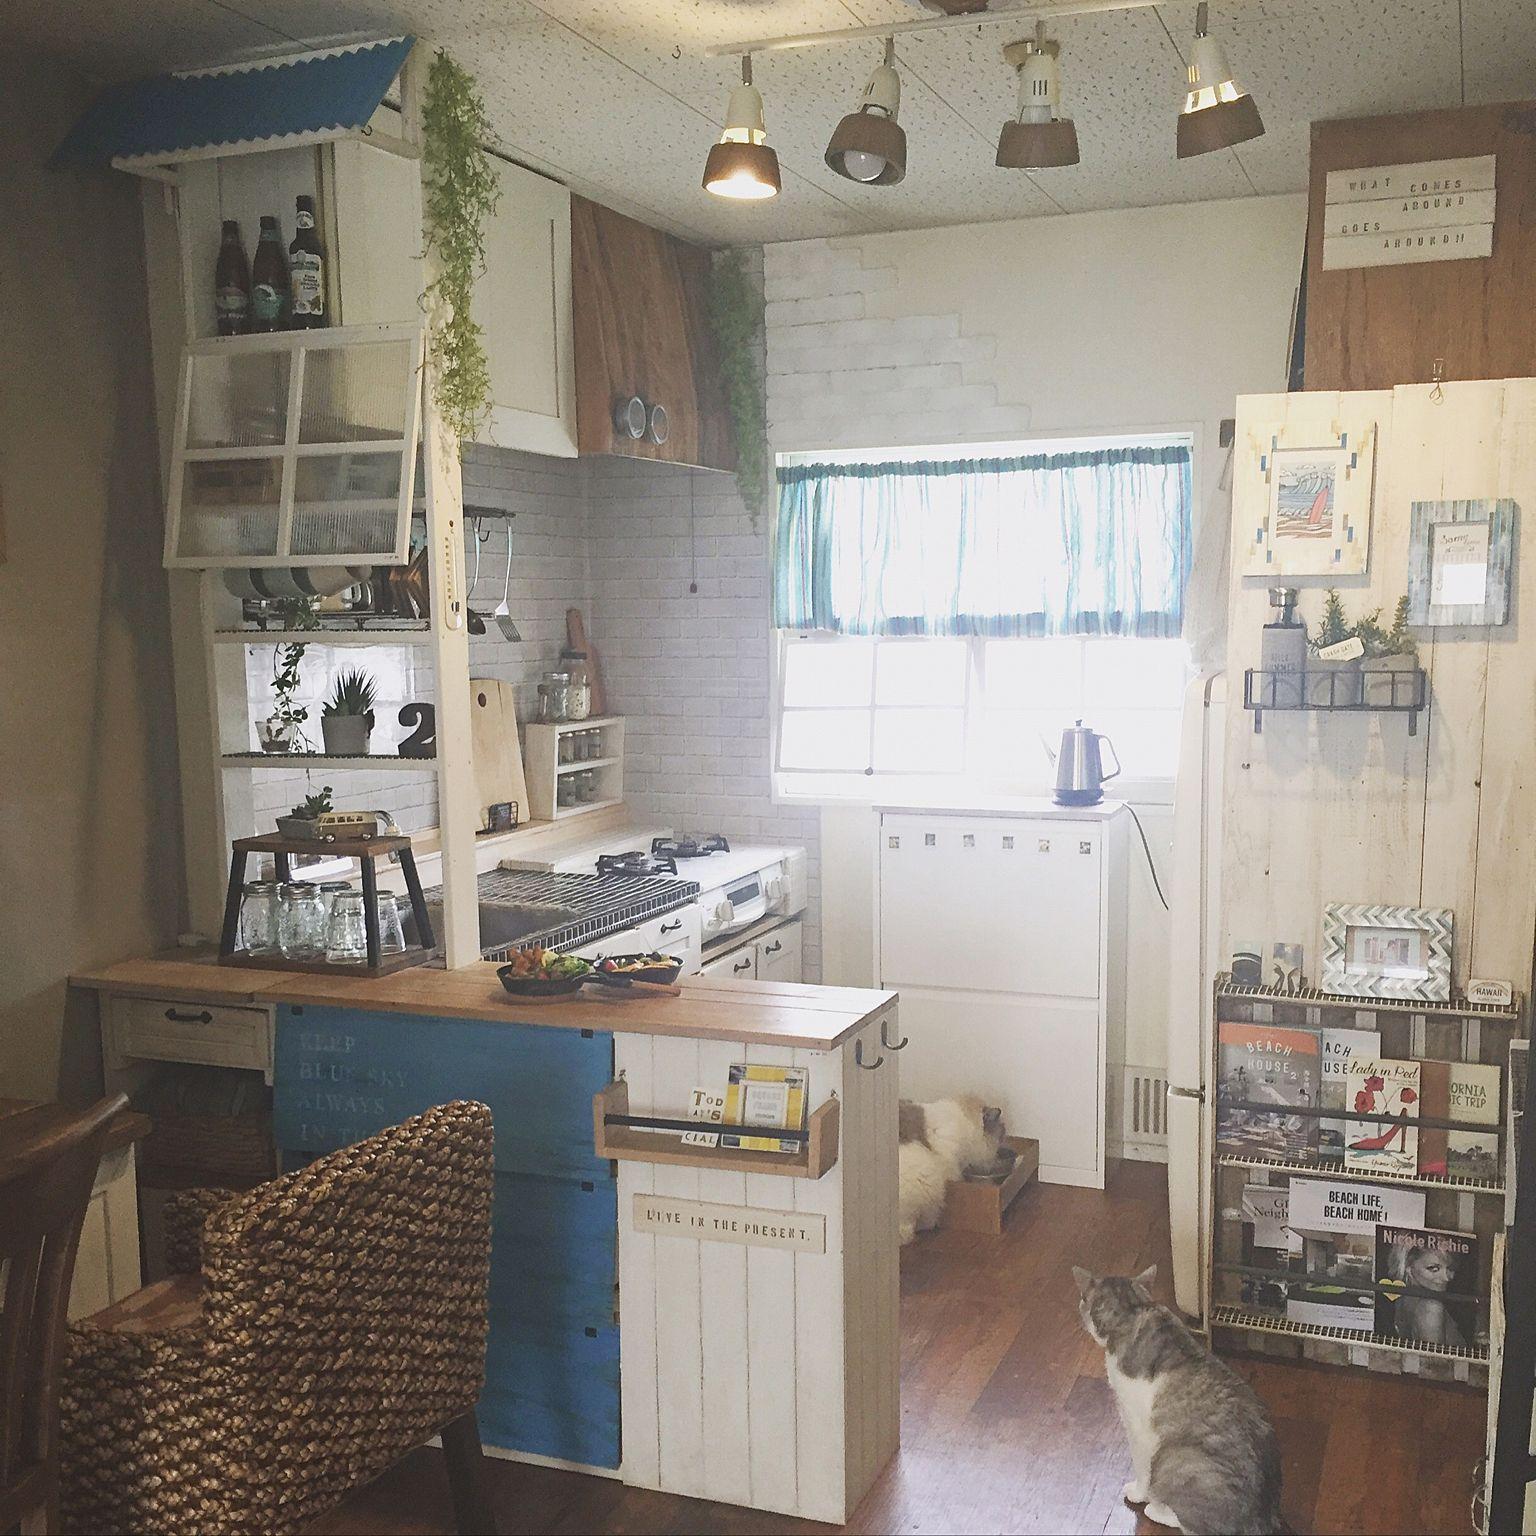 Kitchen/DIY/手作り/キッチンカウンター/賃貸/原状回復...などのインテリア実例 - 2016-07-04 06:10:10